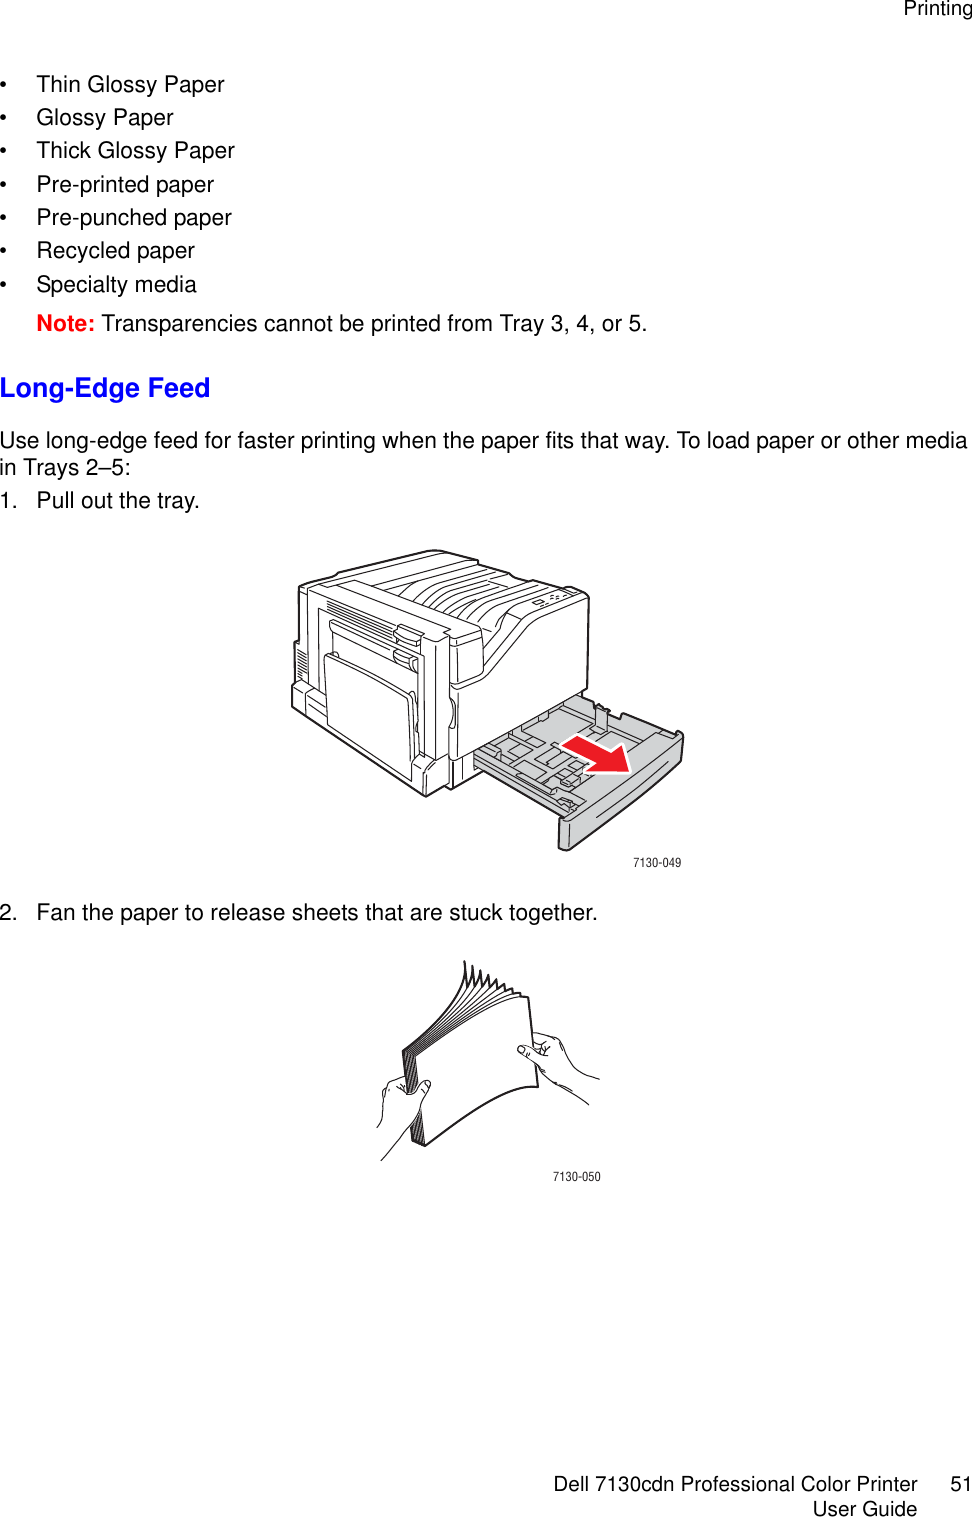 Dell 7130Cdn Color Laser Printer Users Manual User's Guide